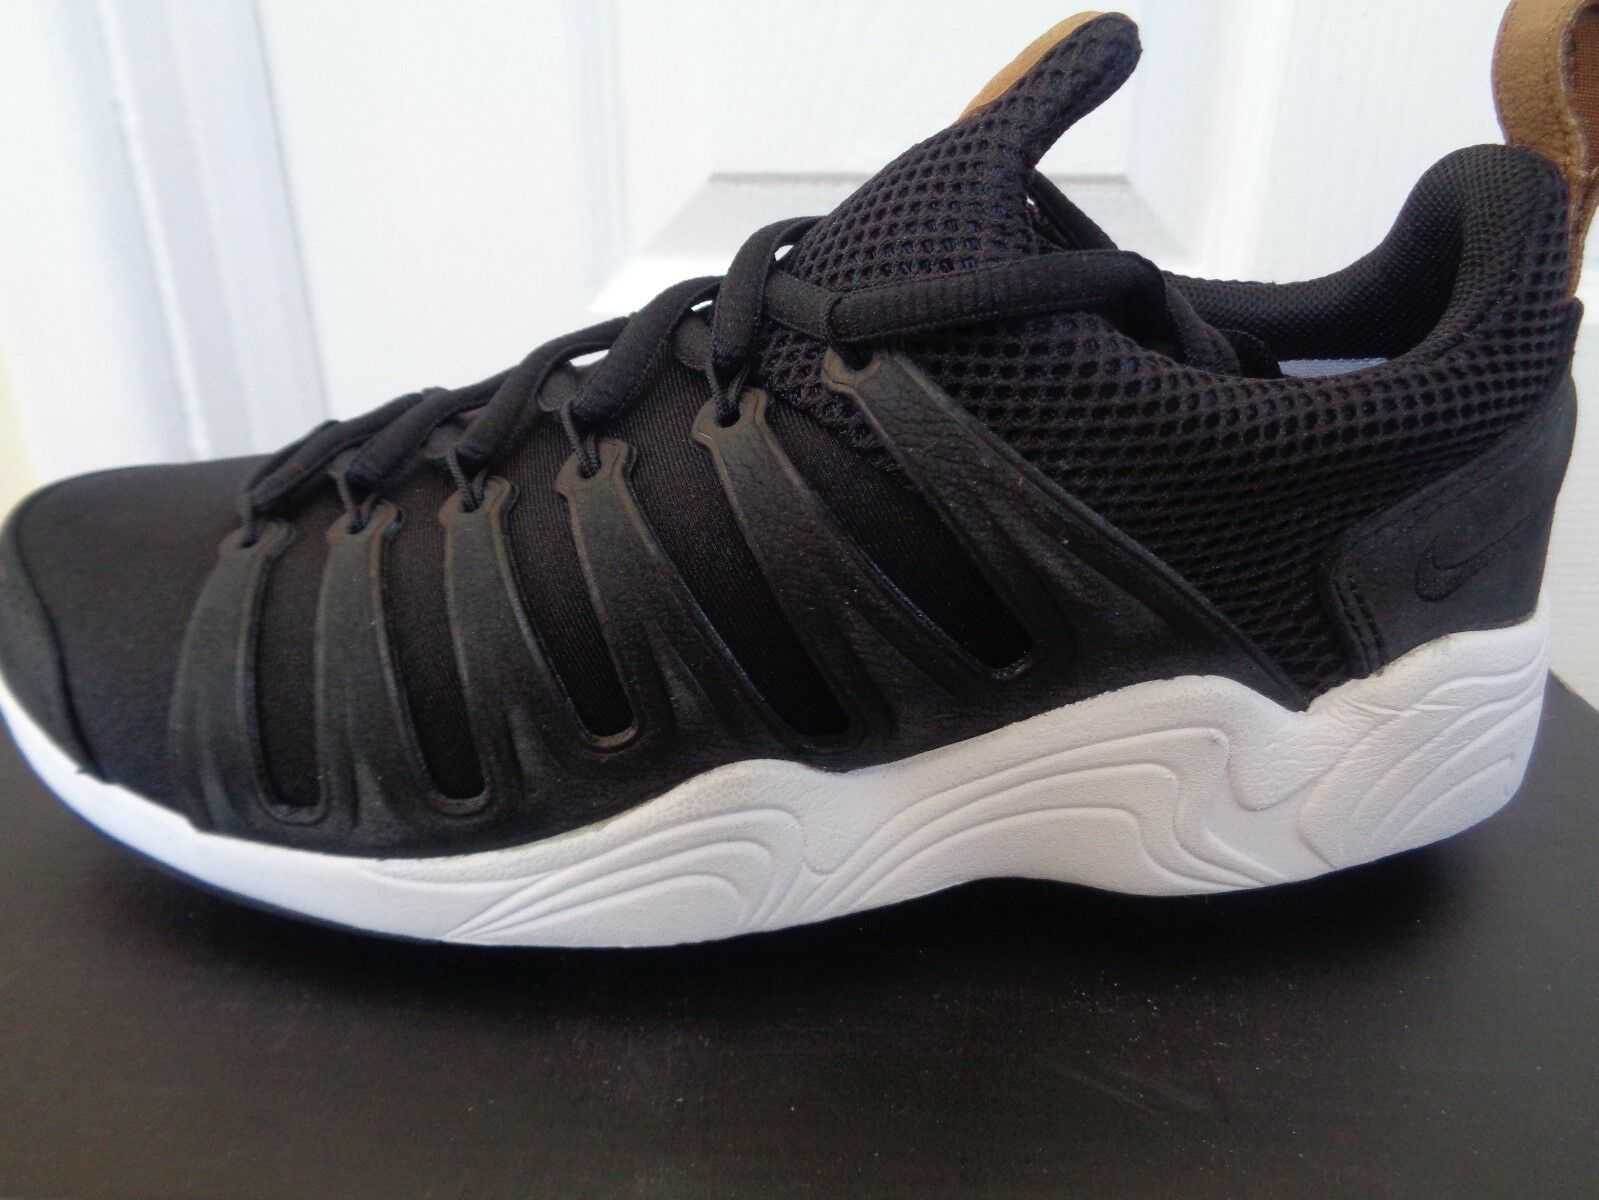 Nike Air Zoom Spirimic trainers sneakers 881983 002 uk 4 eu 36.5 us 4.5 NEW+BOX